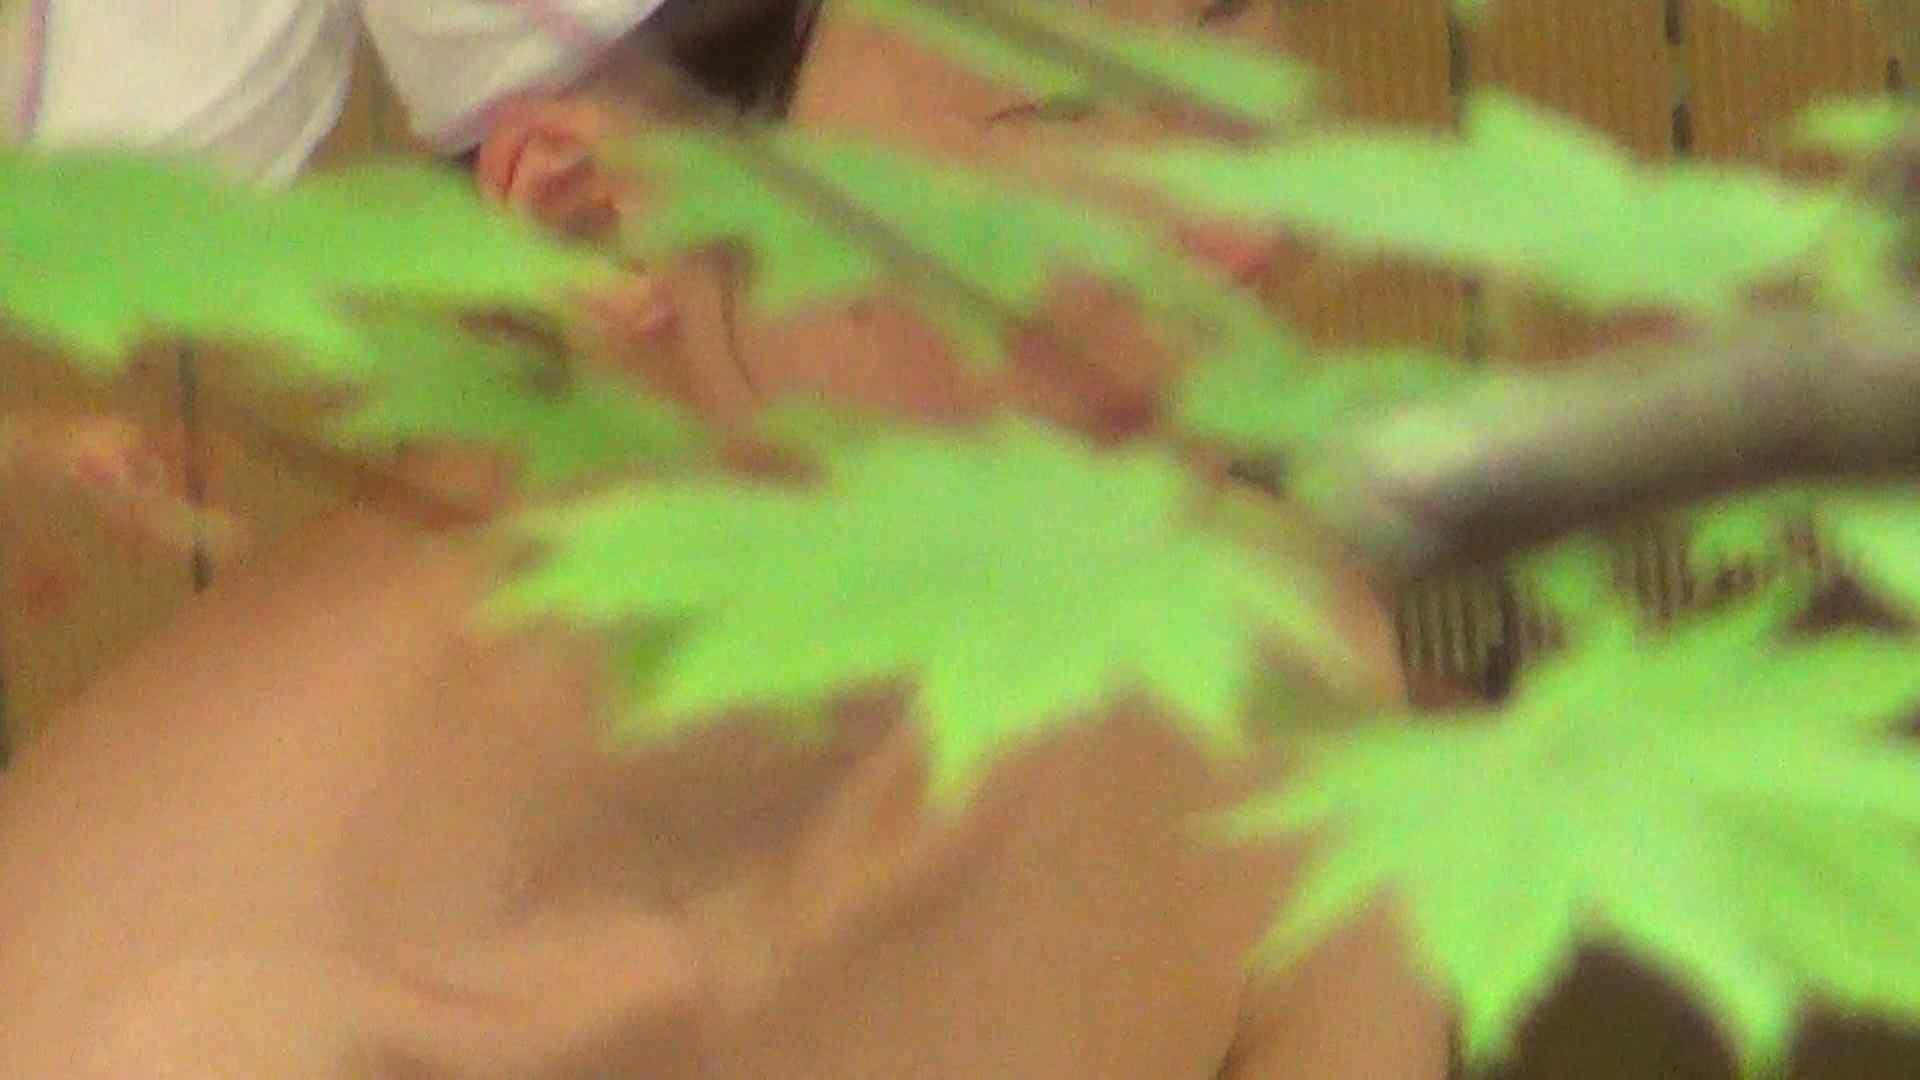 Aquaな露天風呂Vol.247 OLのエロ生活 おめこ無修正画像 83連発 5